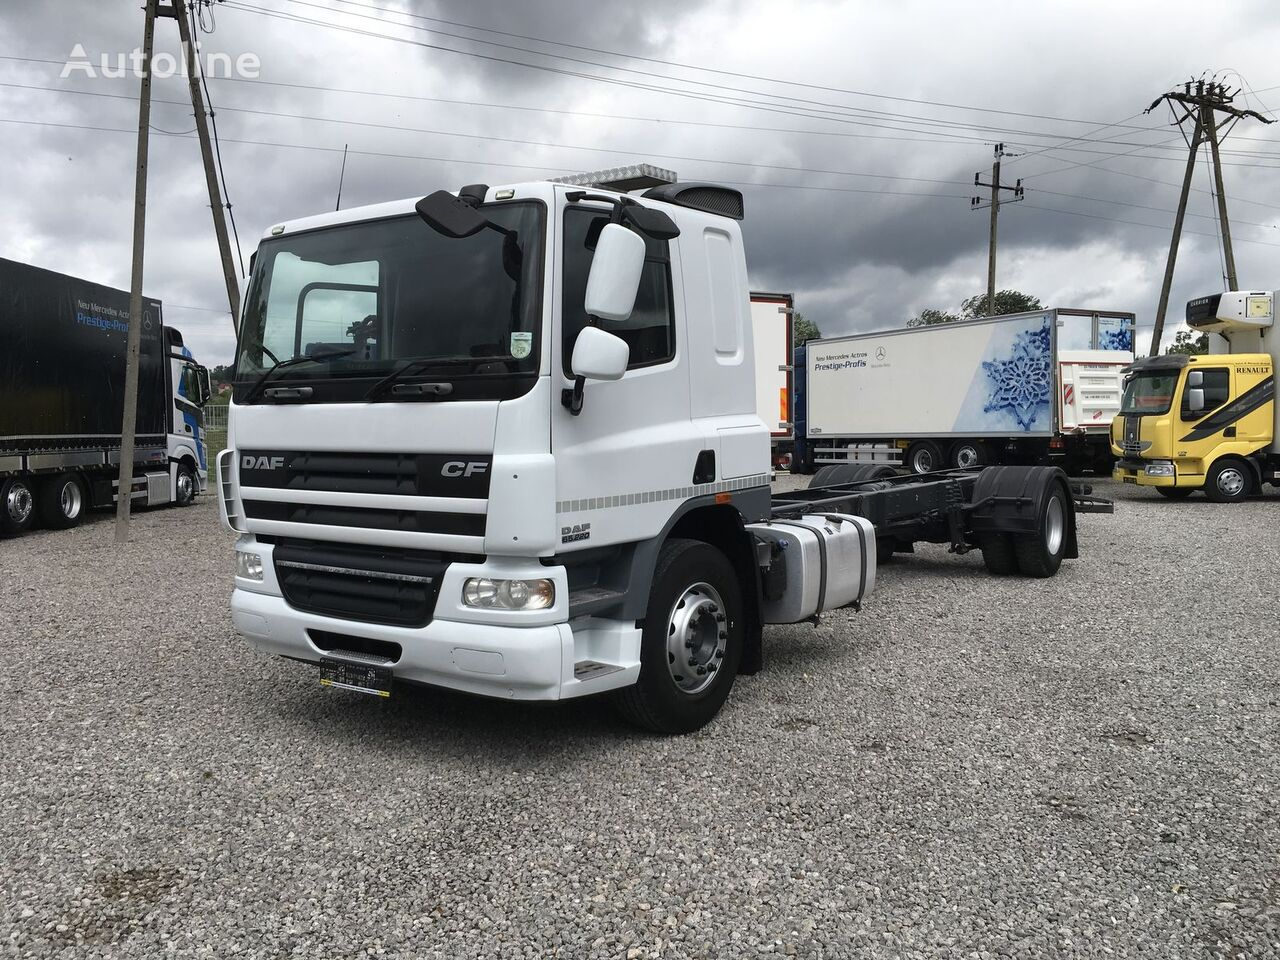 DAF CF 65.220 kamion šasija